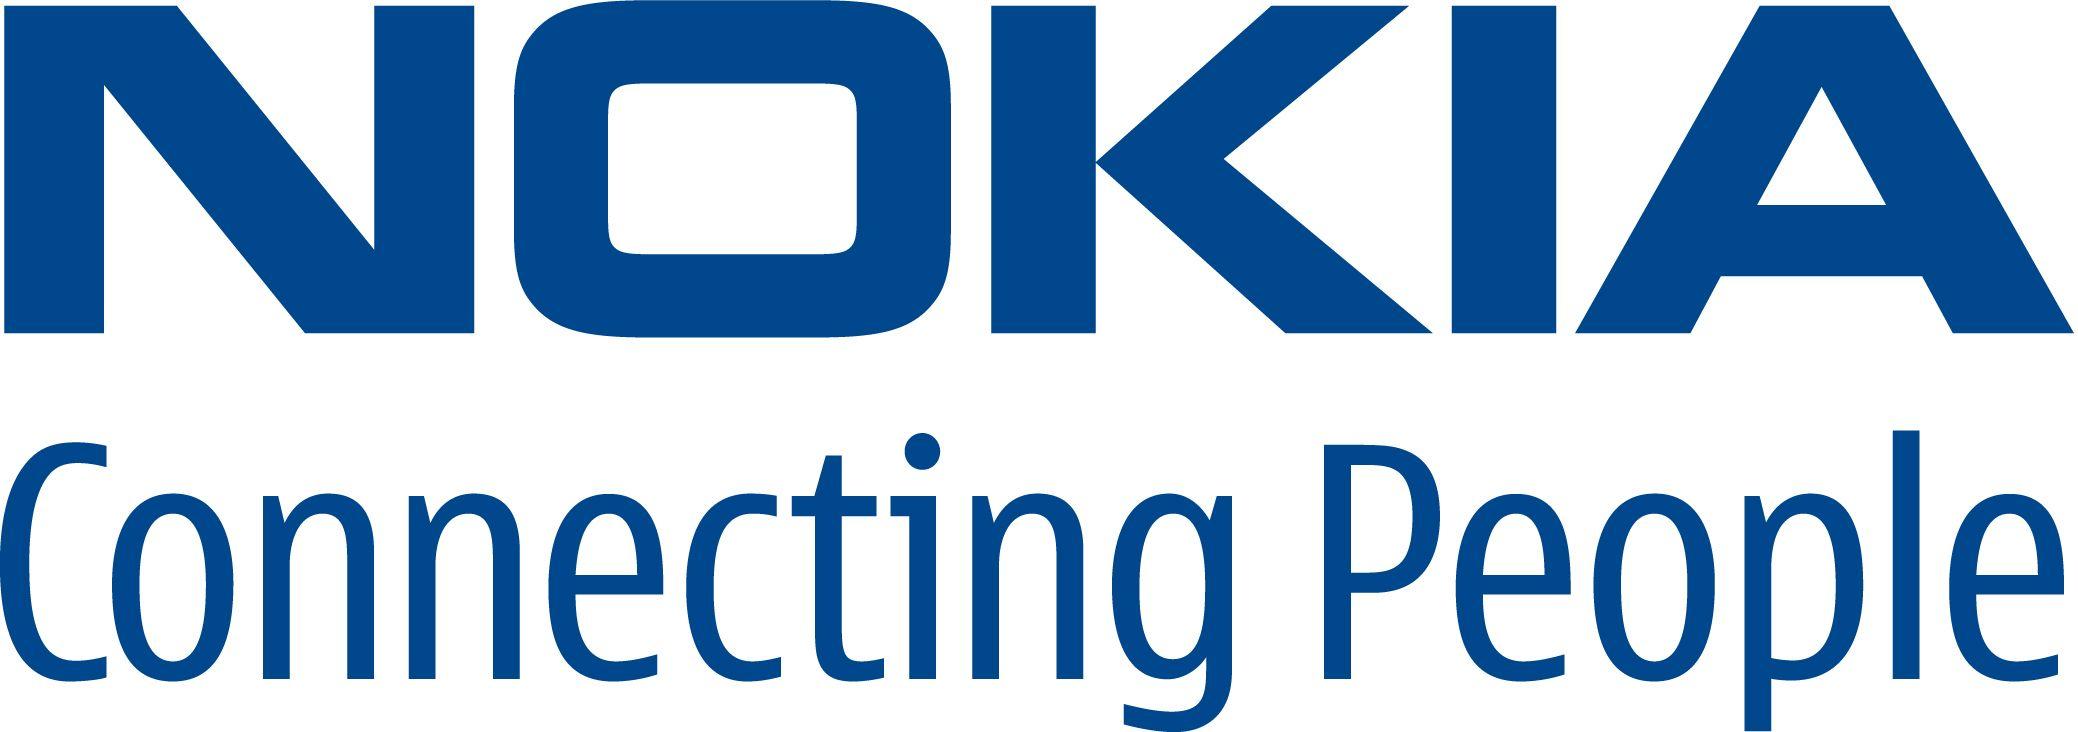 Nokia logo wallpapers HD